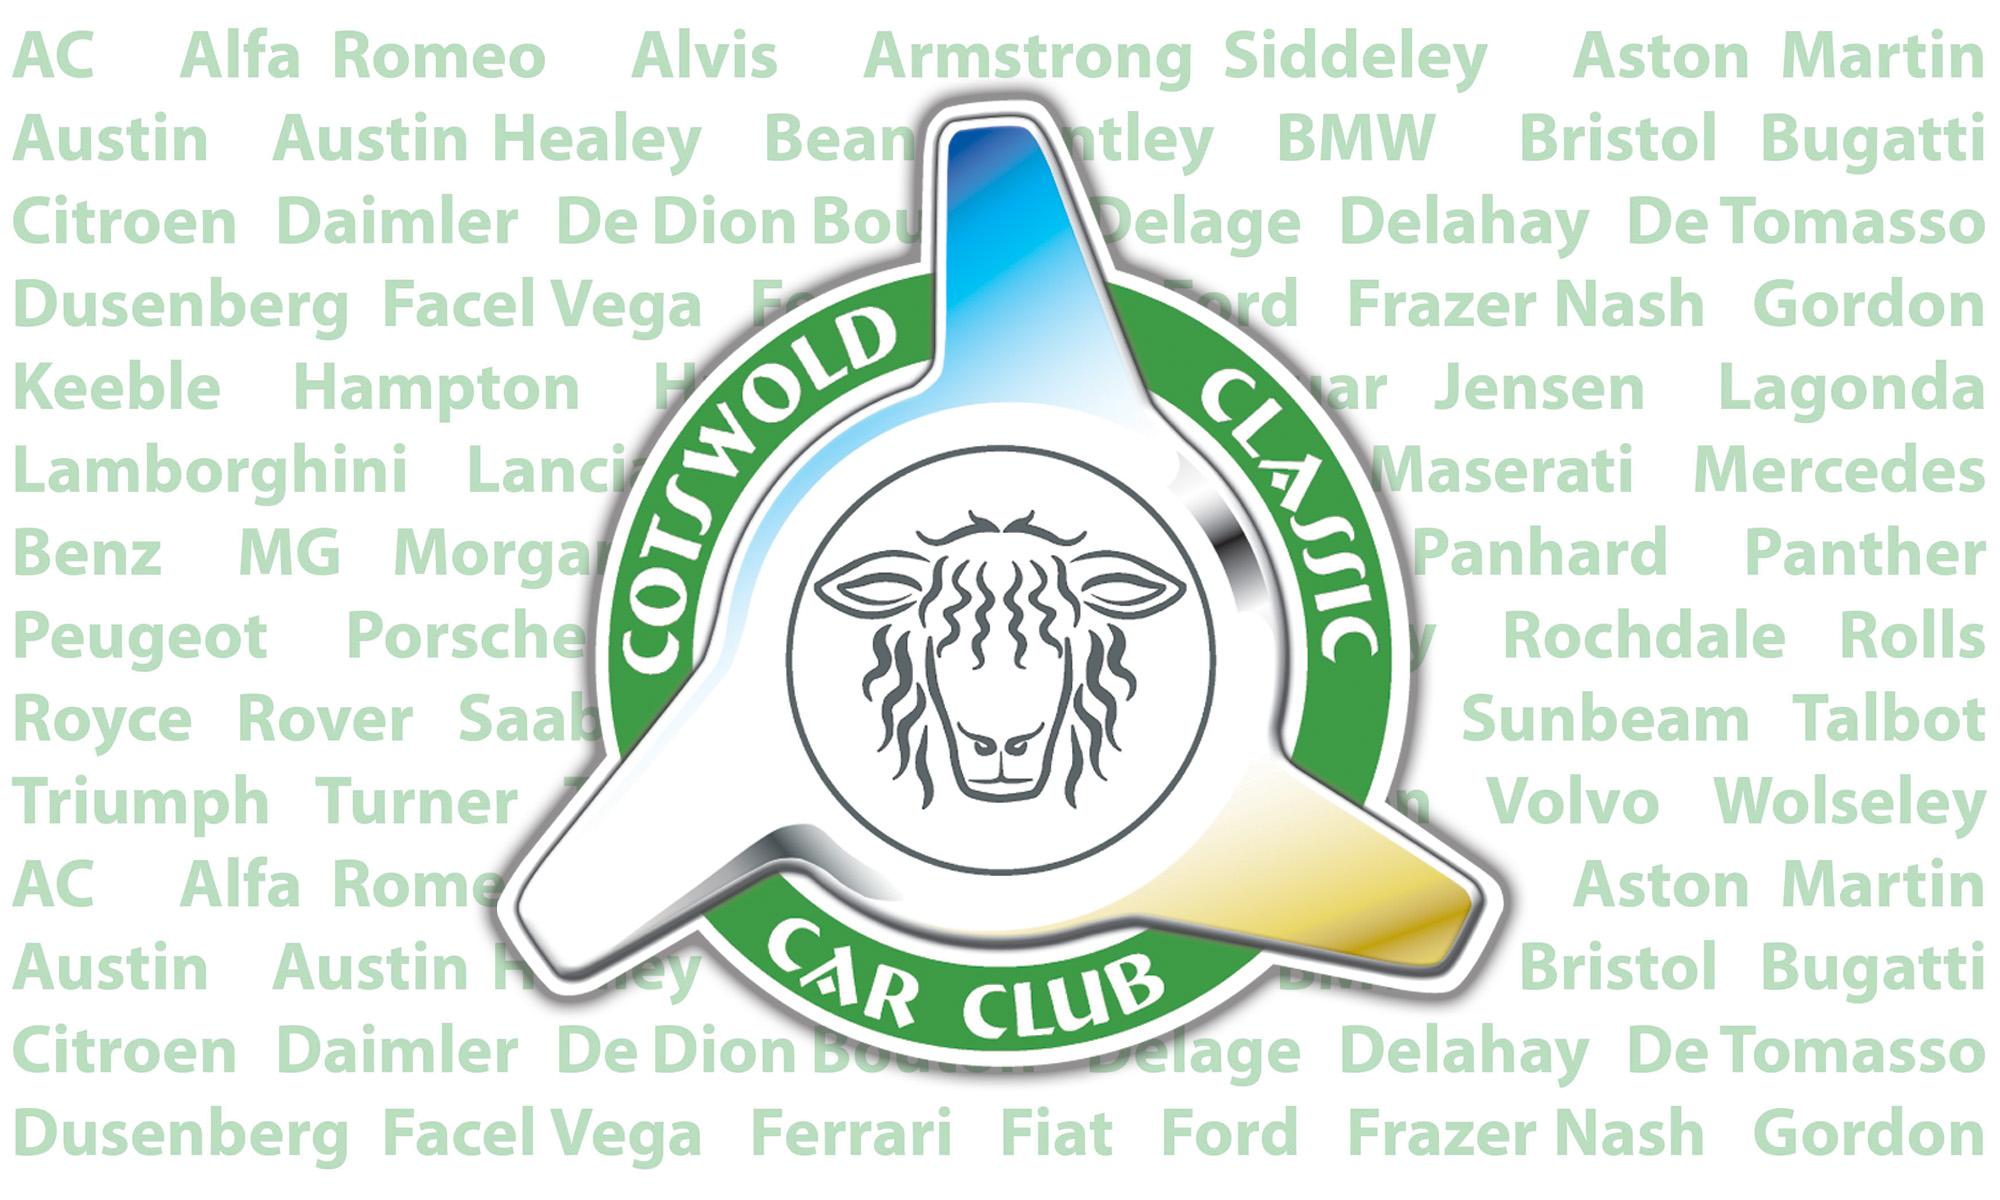 Cotswold Classic Car Club